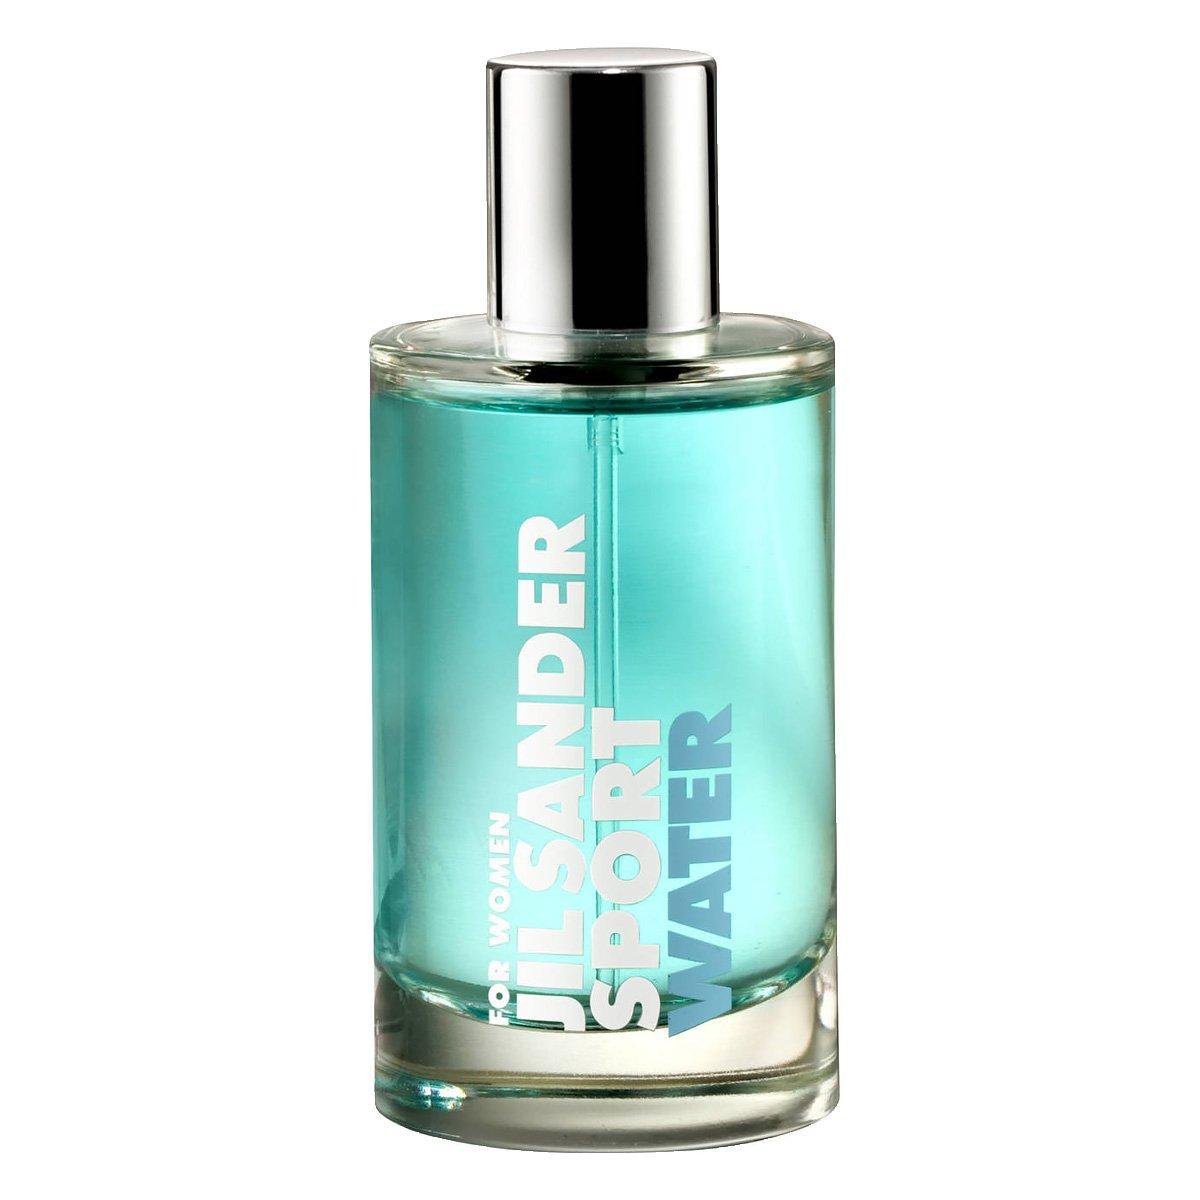 100 мл Jil Sander Sport Water for Women (ж) (голубая)